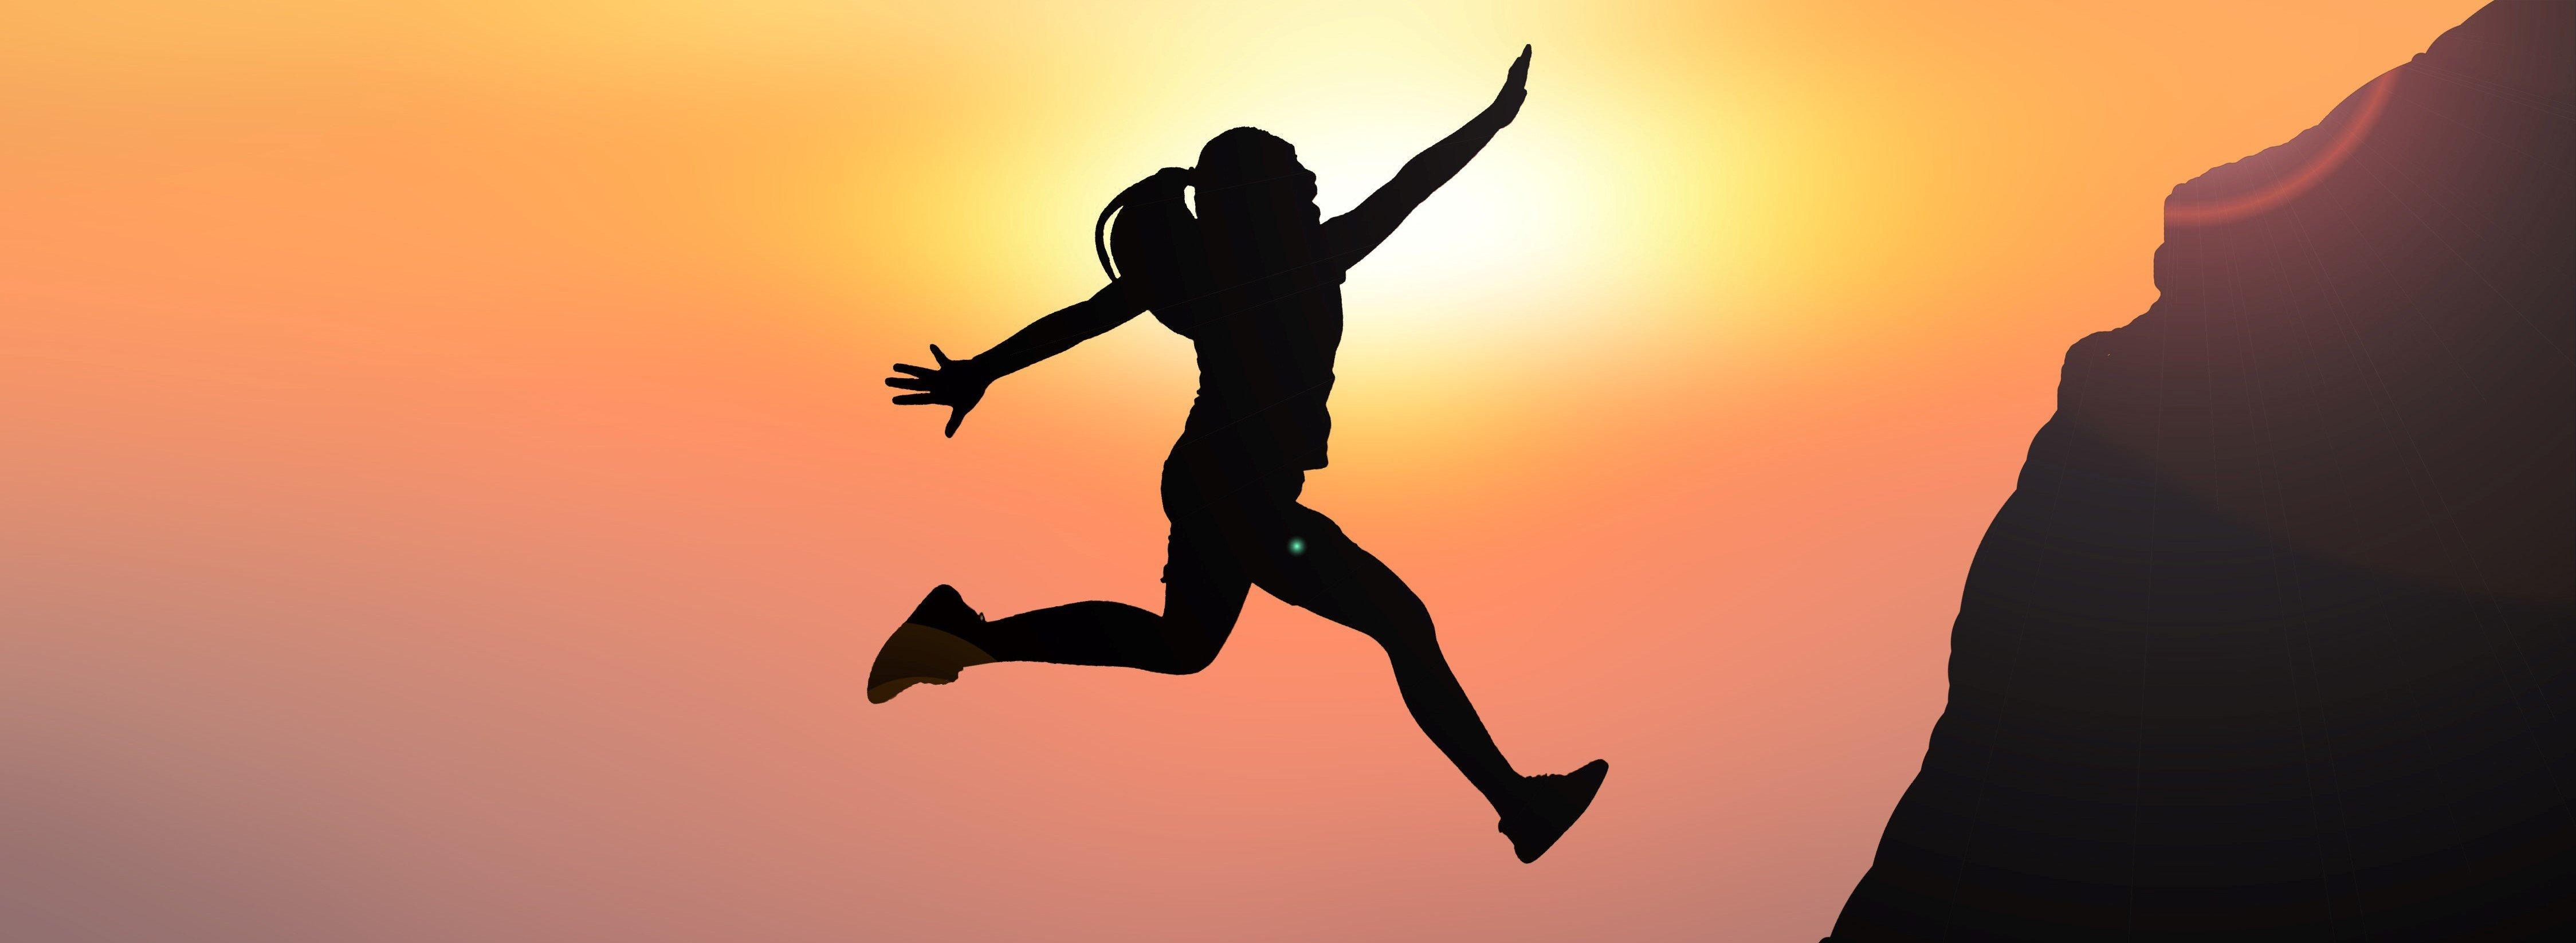 Silhouette women jumping